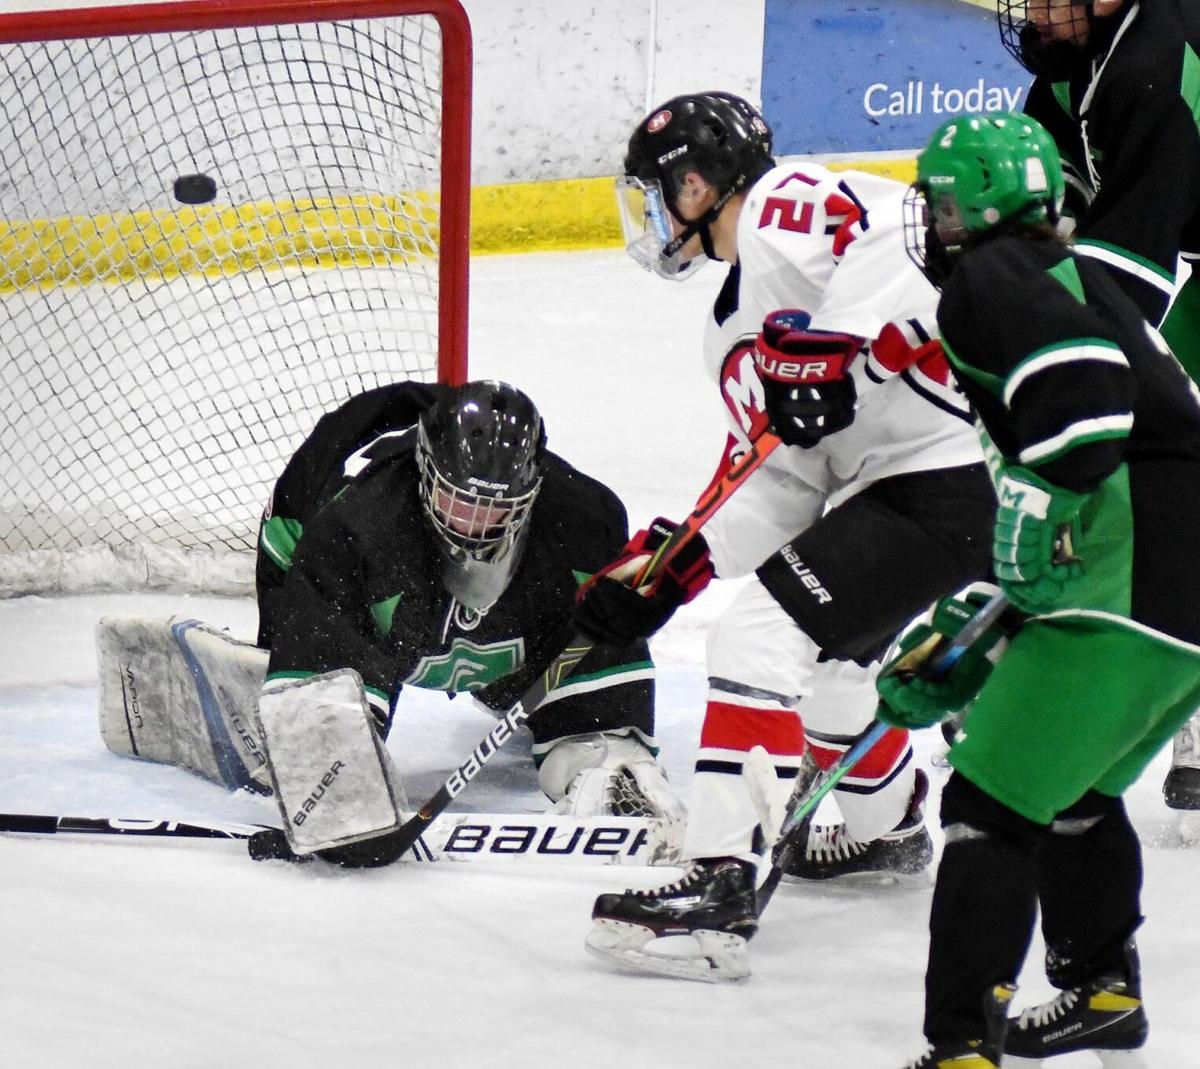 West vs. La Crescent hockey 1